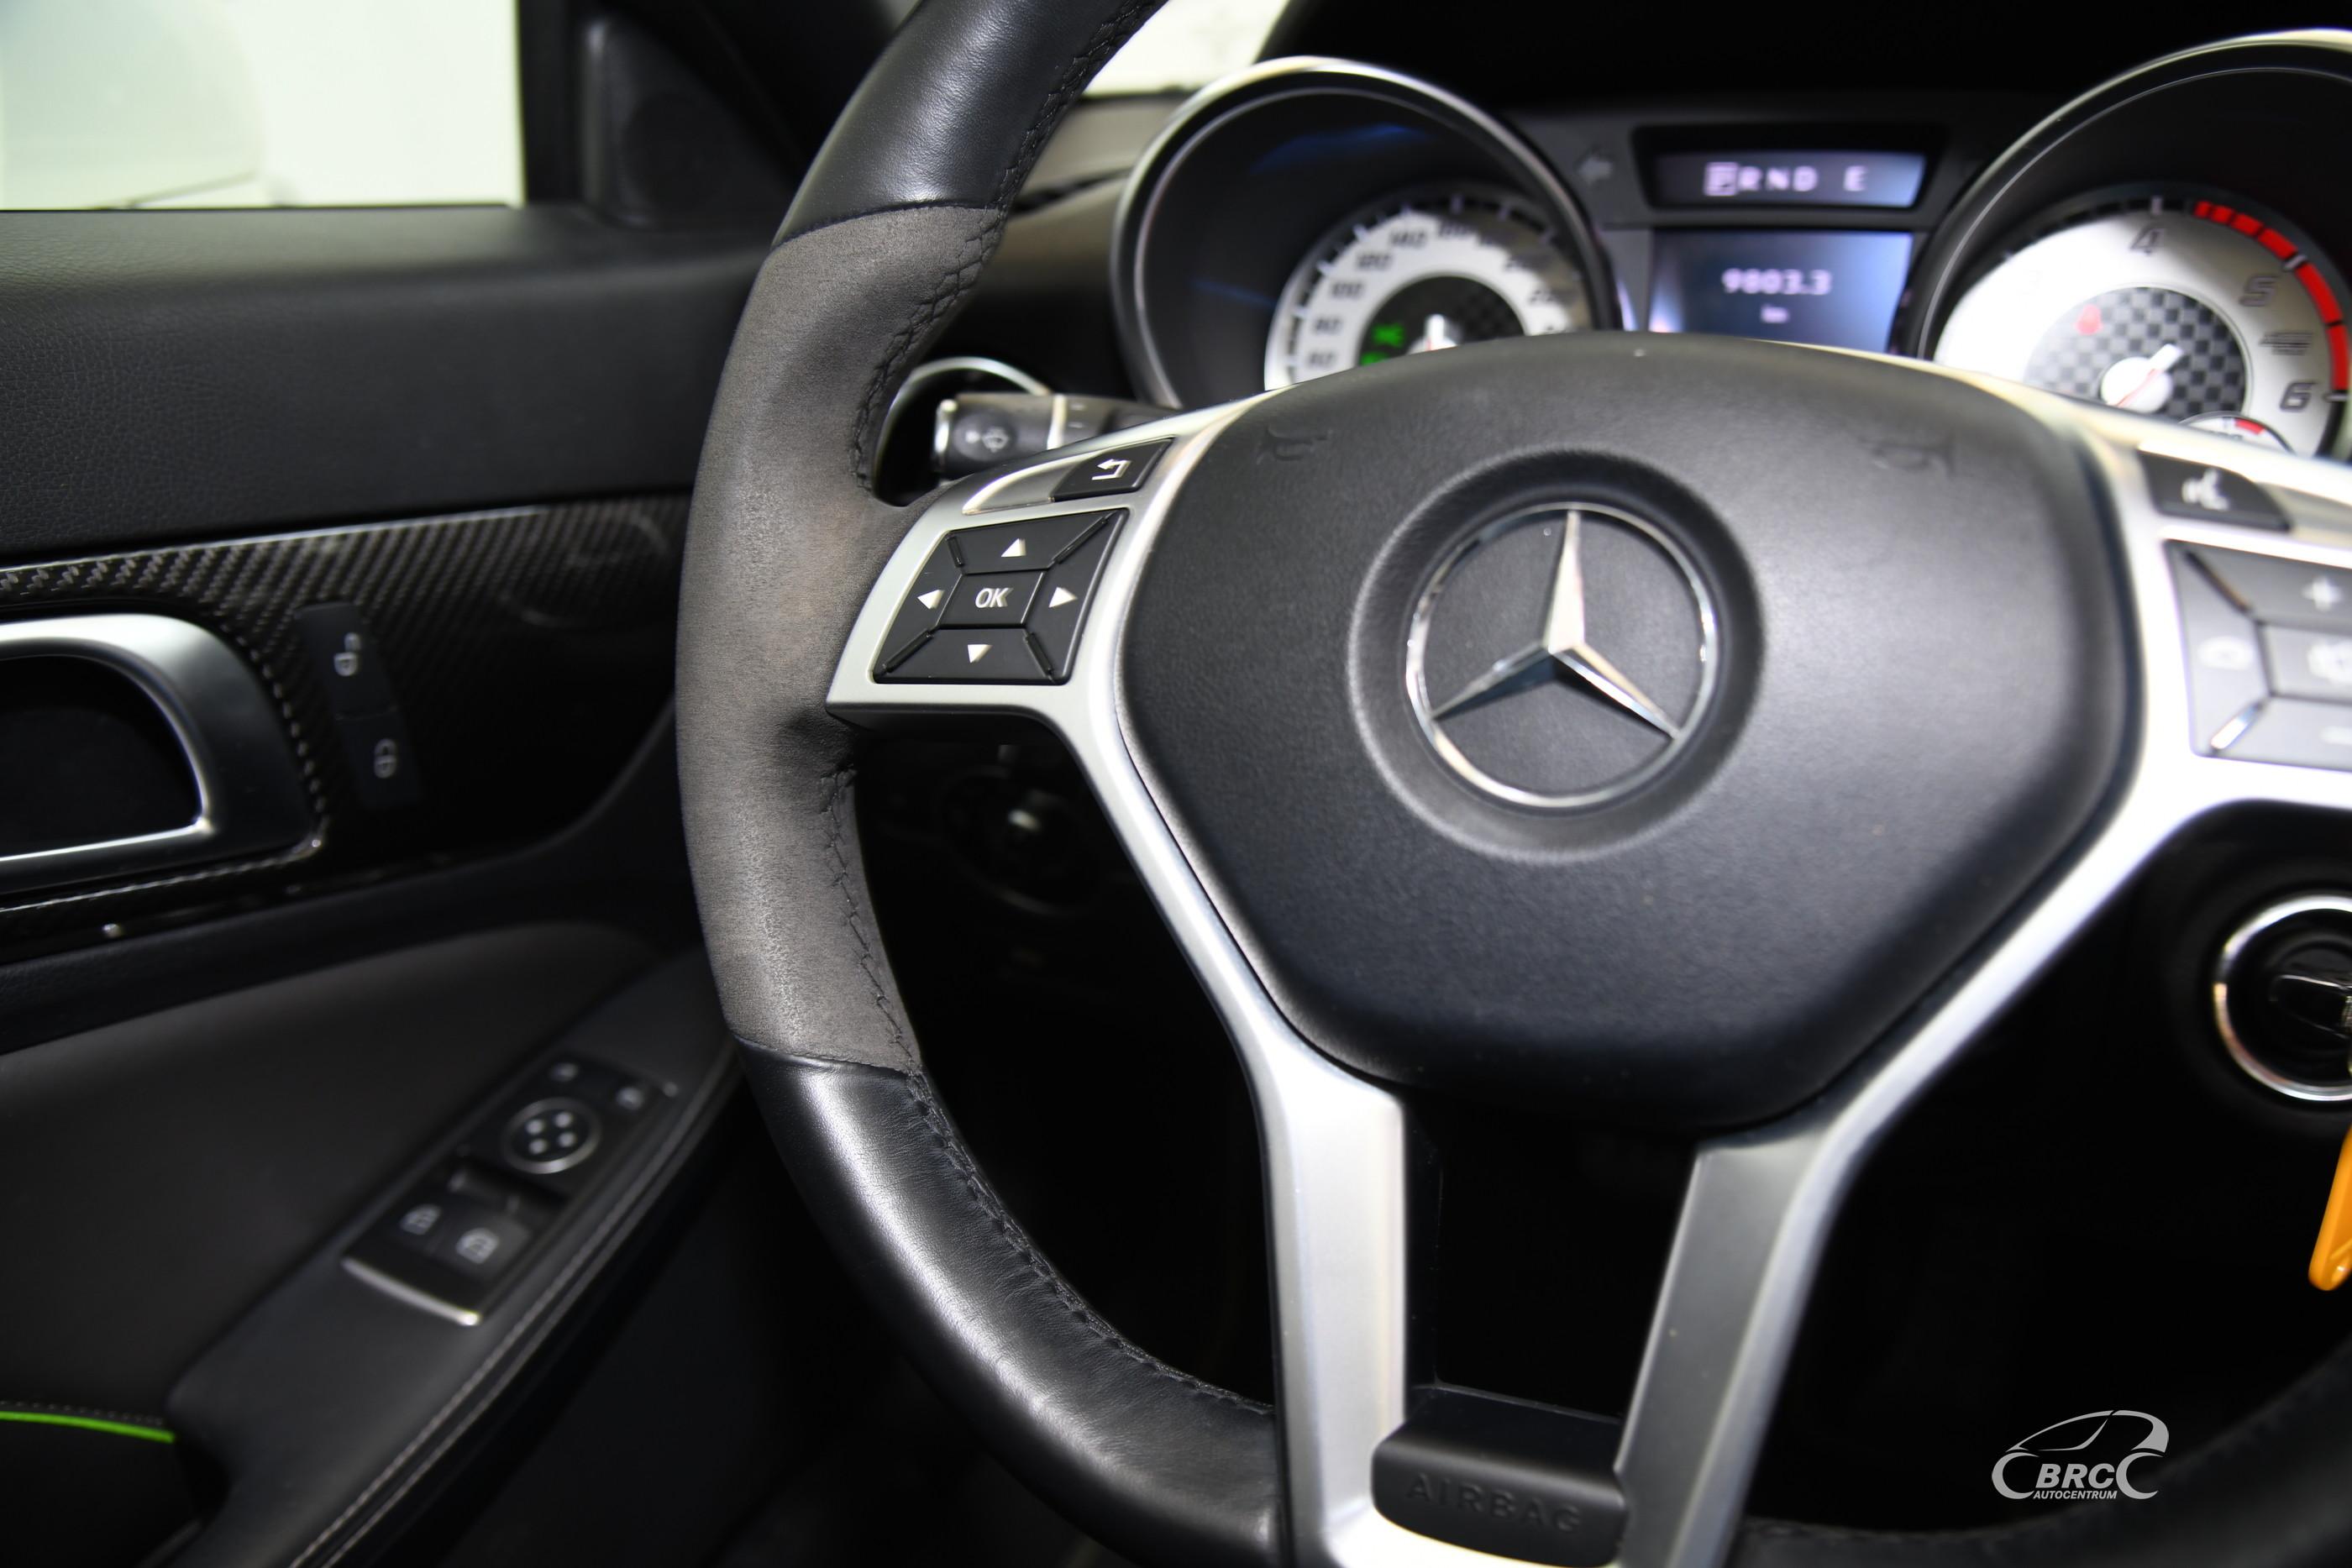 Mercedes-Benz SLK 250 CDI BlueEfficiency Carbon Look Edition Roadster Au